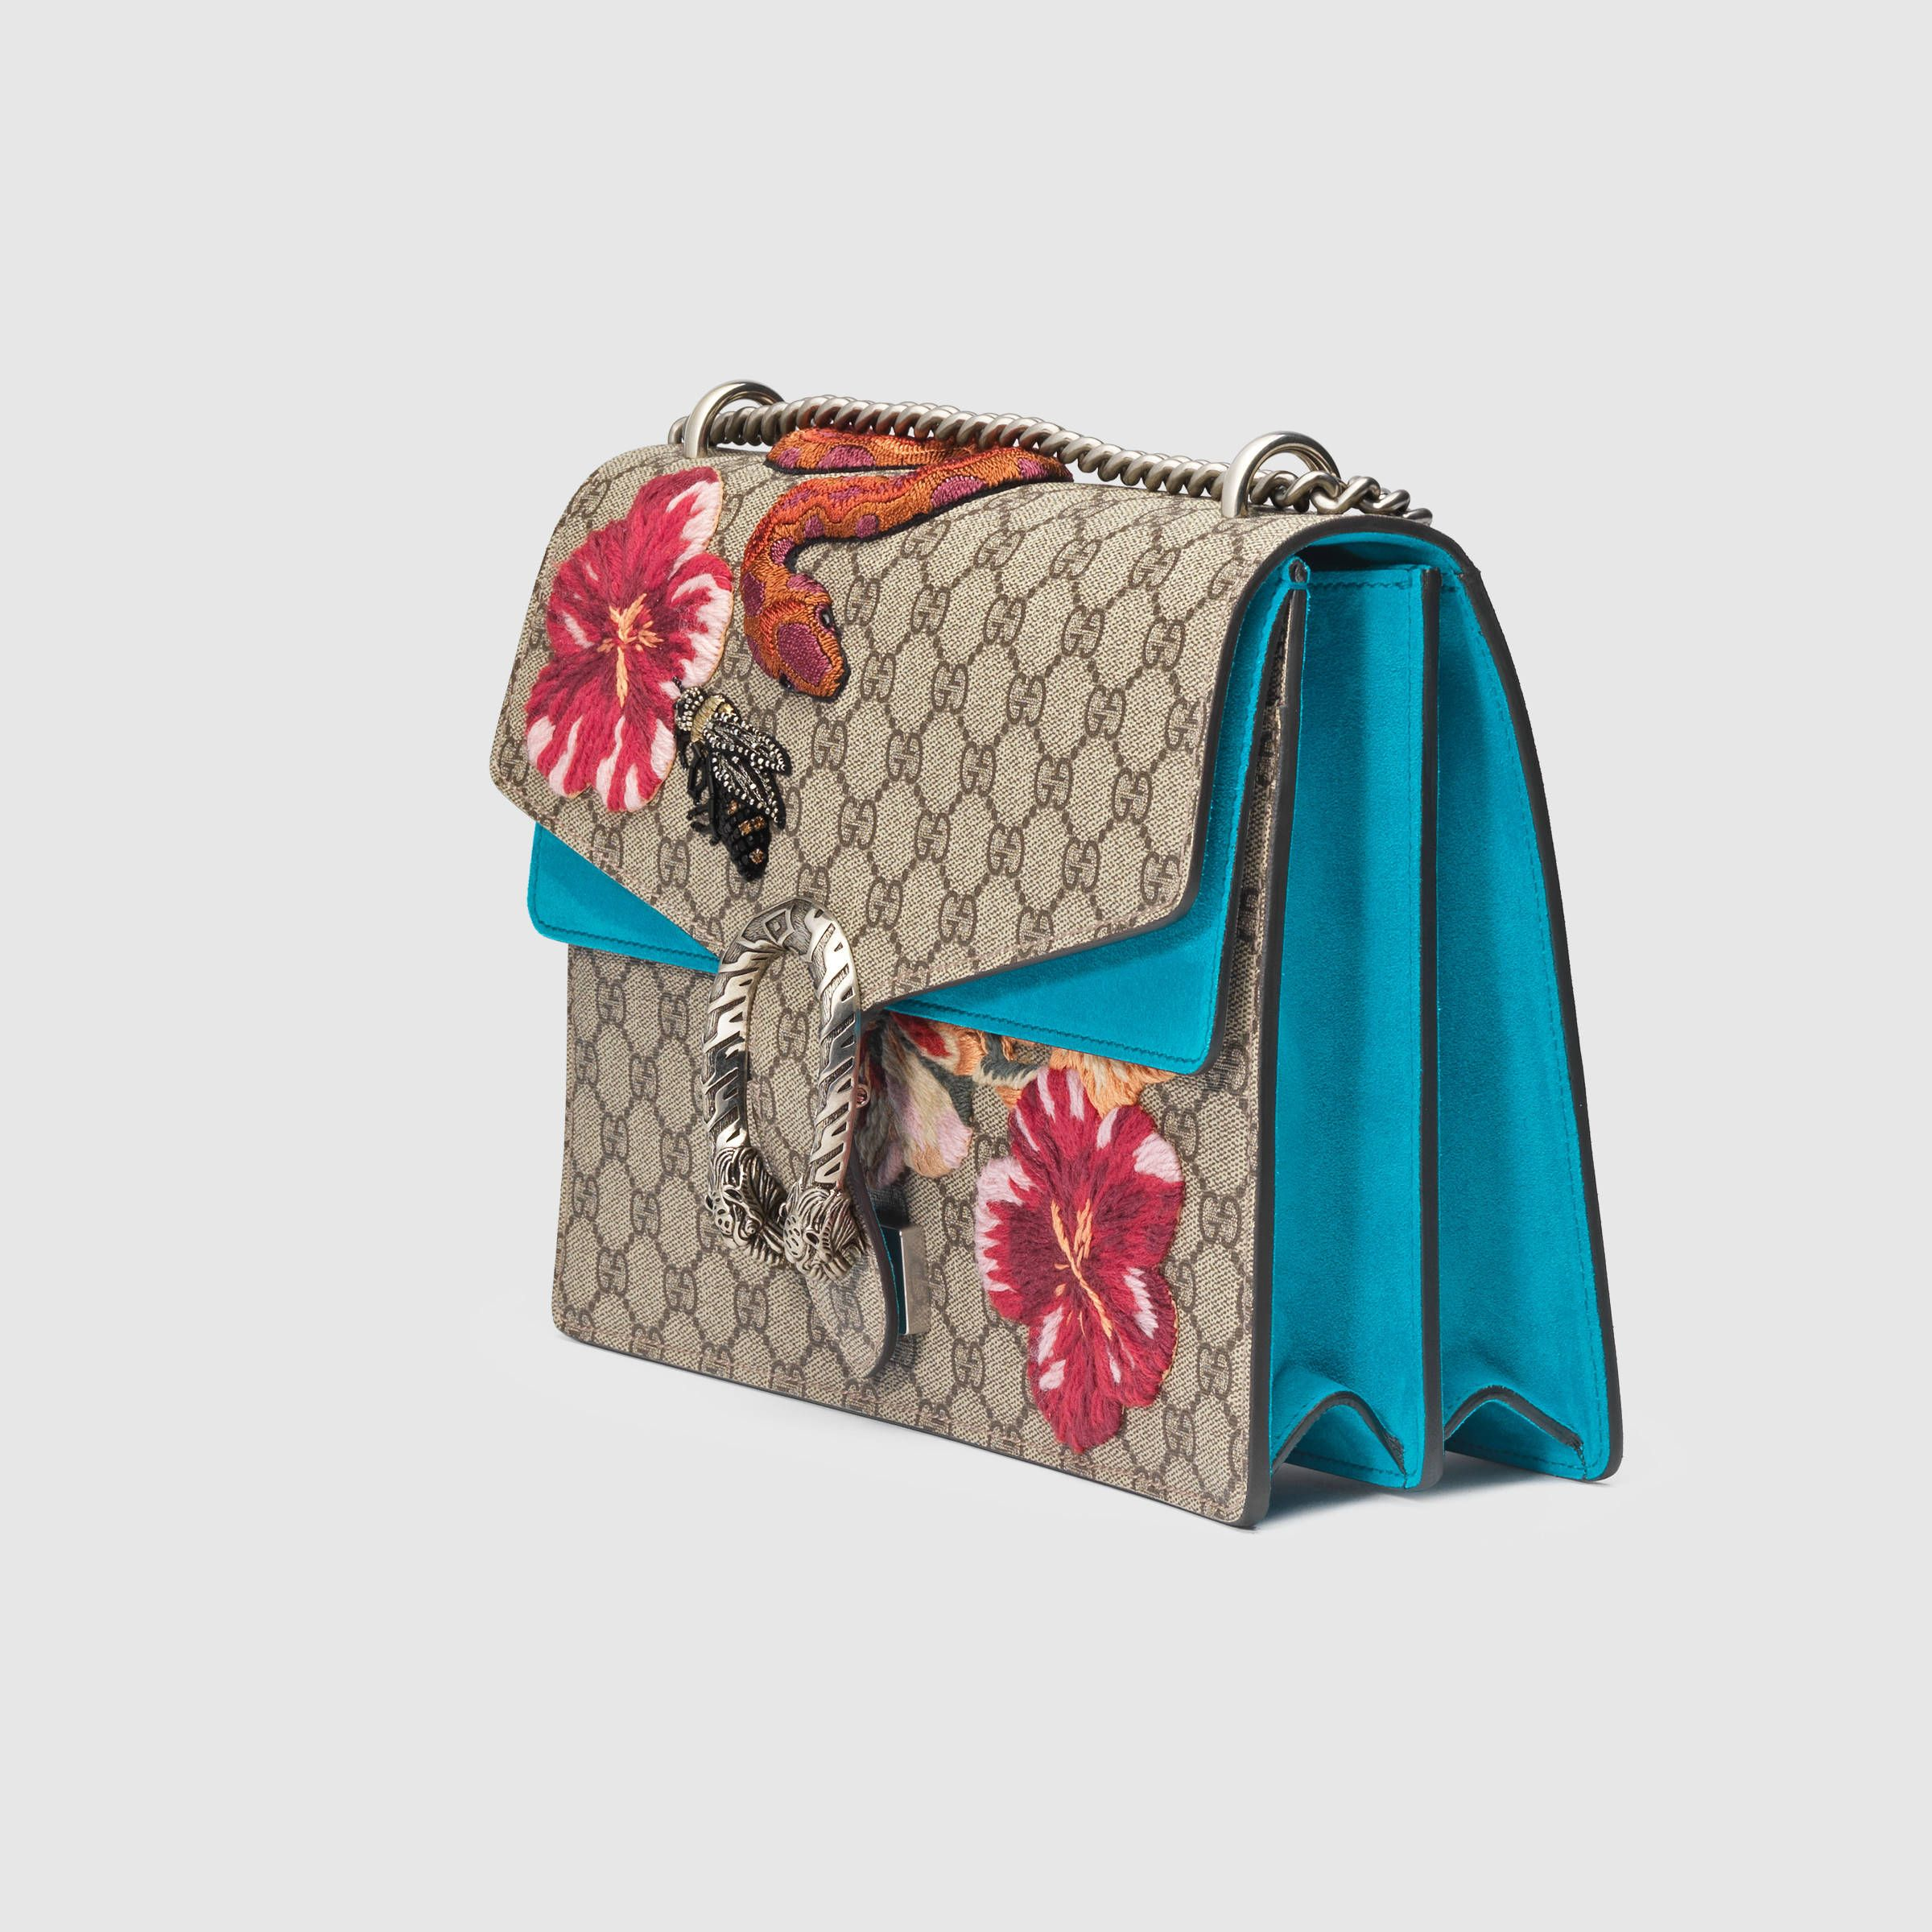 6e2c872f9187 Gucci Women - Dionysus GG Supreme embroidered bag - 400235KHNVN8786 ...